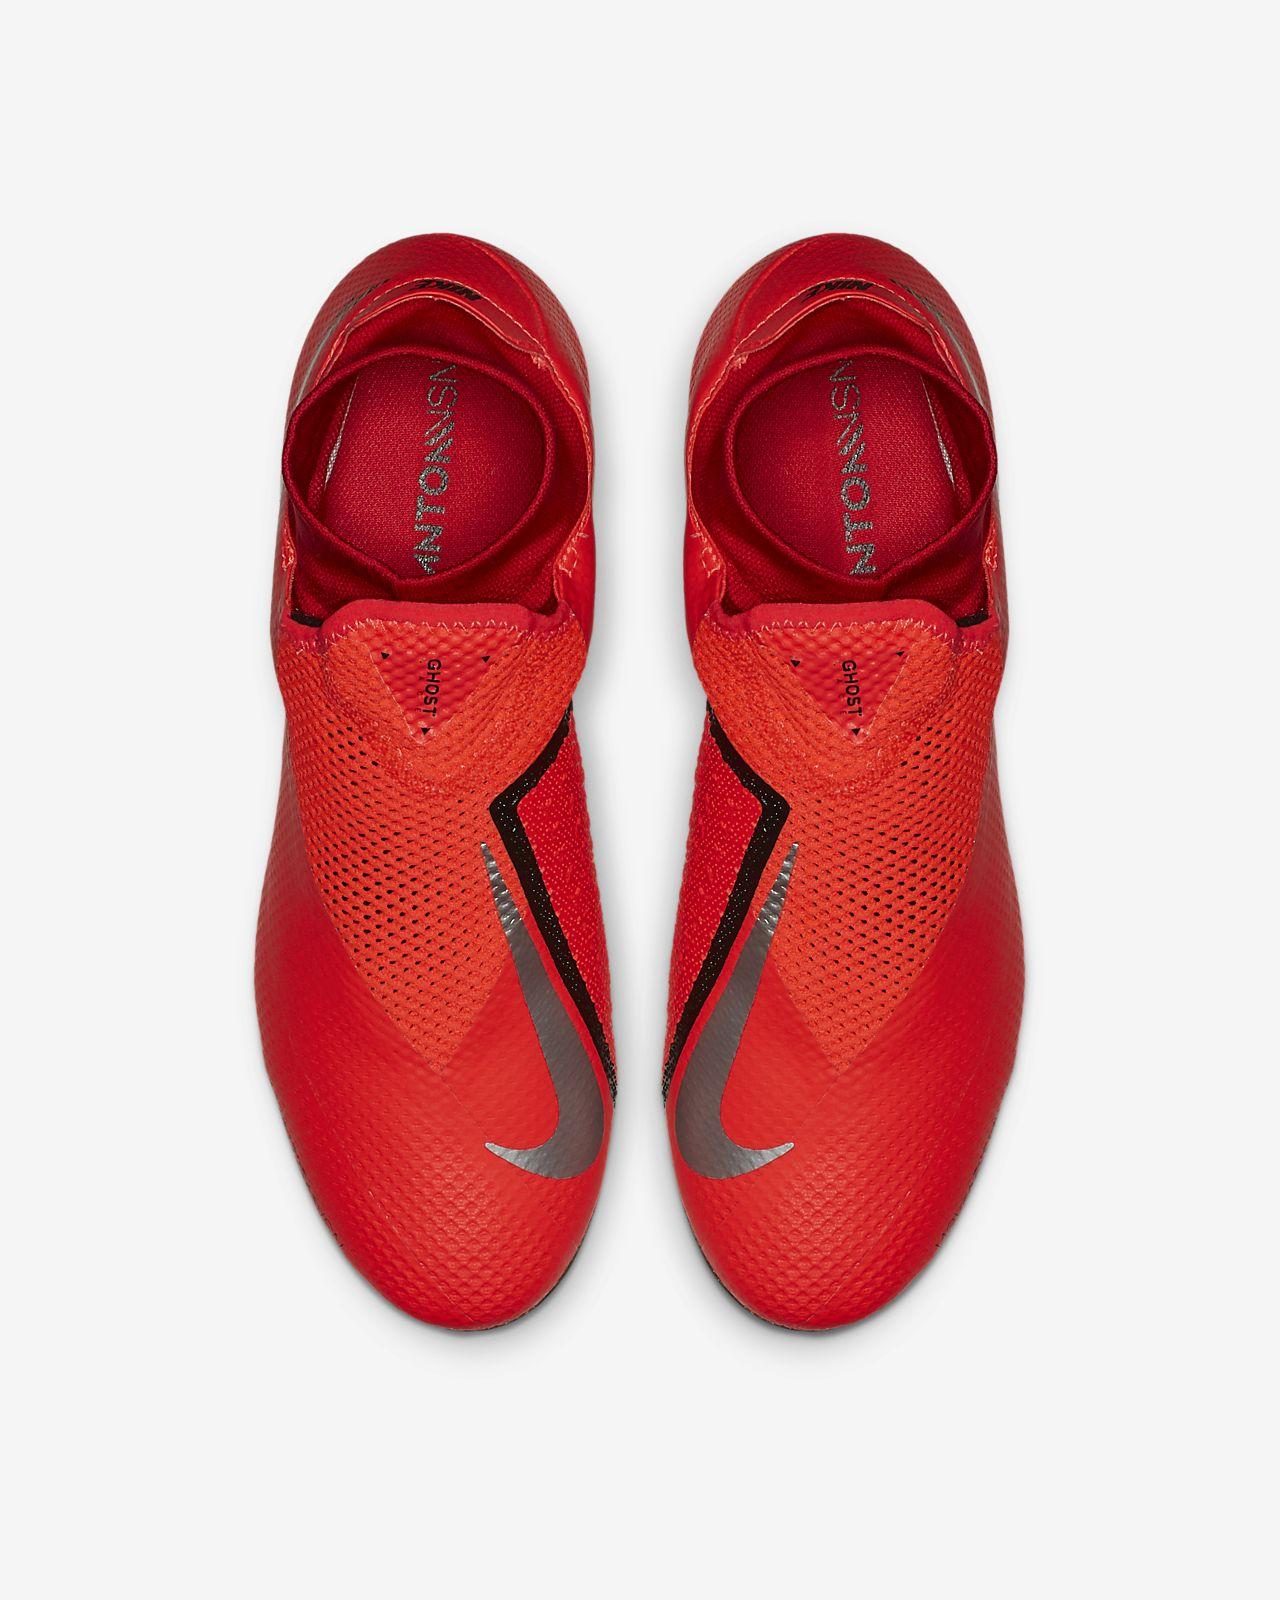 ... Calzado de fútbol para pasto artificial Nike Phantom Vision Pro Dynamic  Fit AG-PRO 86345cfce41c7